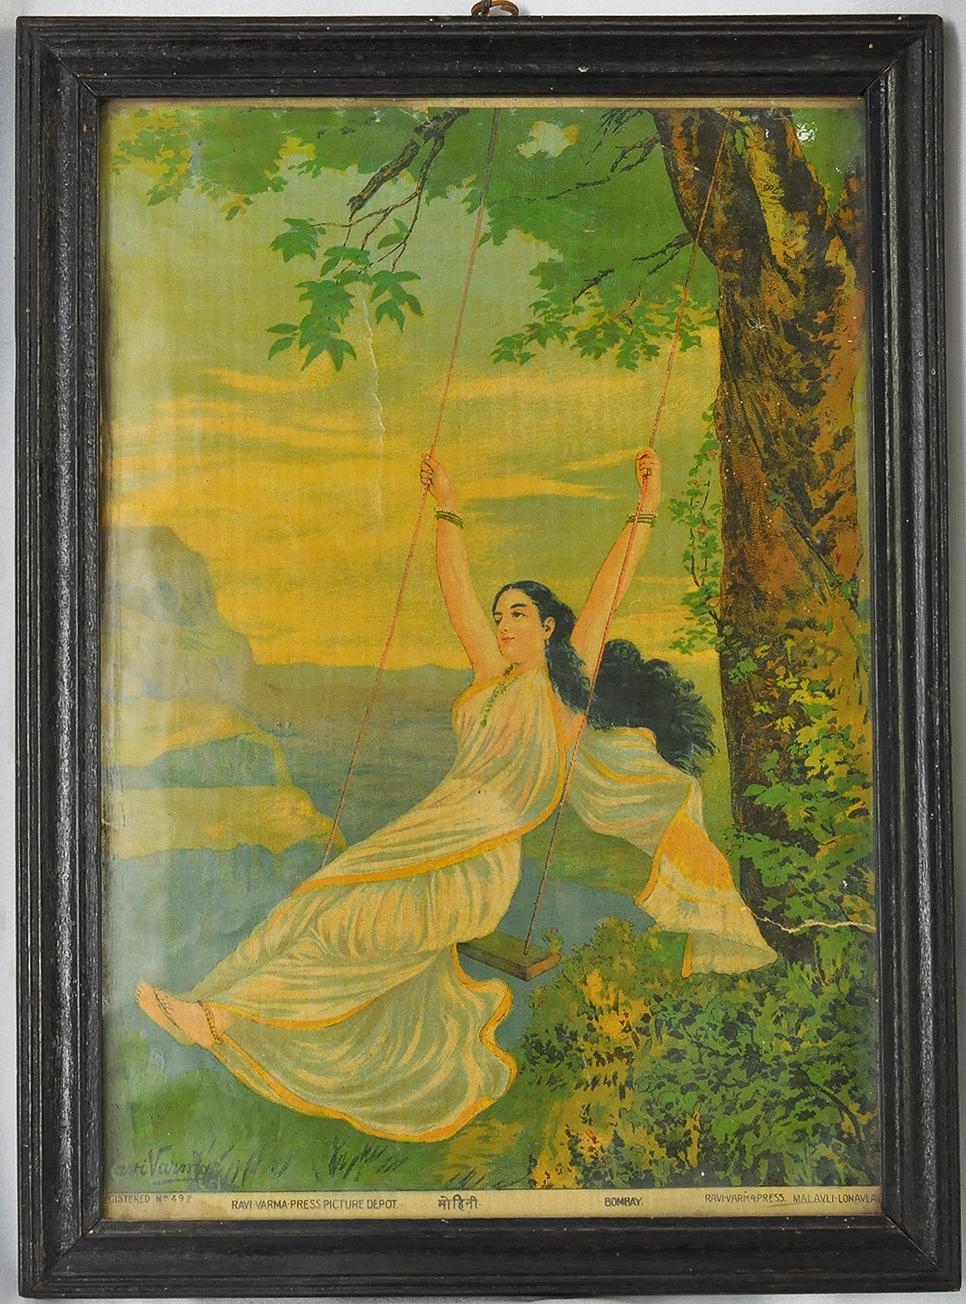 "Raja Ravi Varma's ""Mohini On A Swing"" - Vintage Print 1930s"